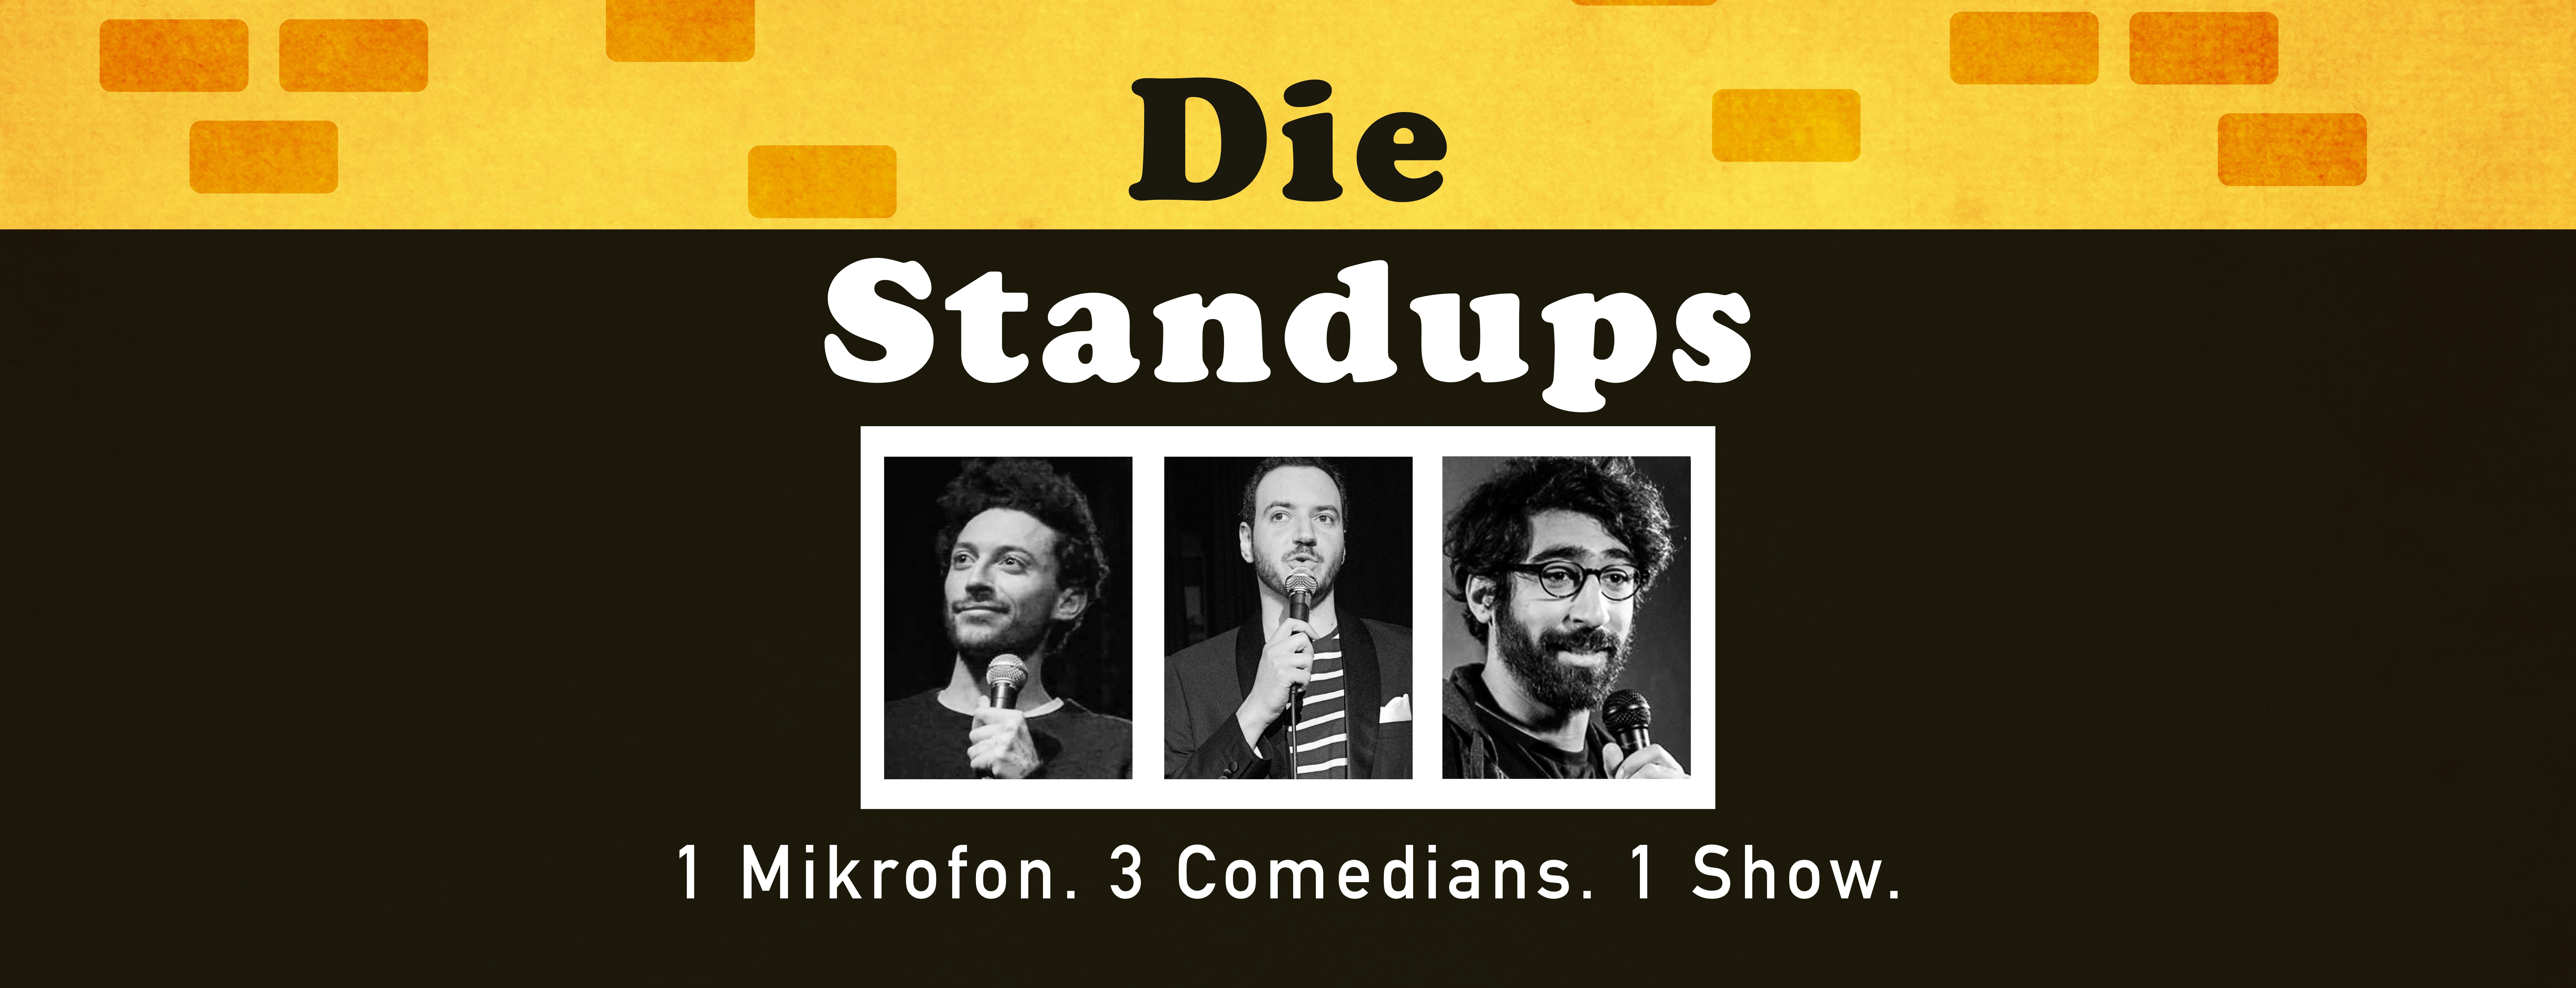 Die Standups - Authentische Standup Comedy aus Berlin// Regensburg